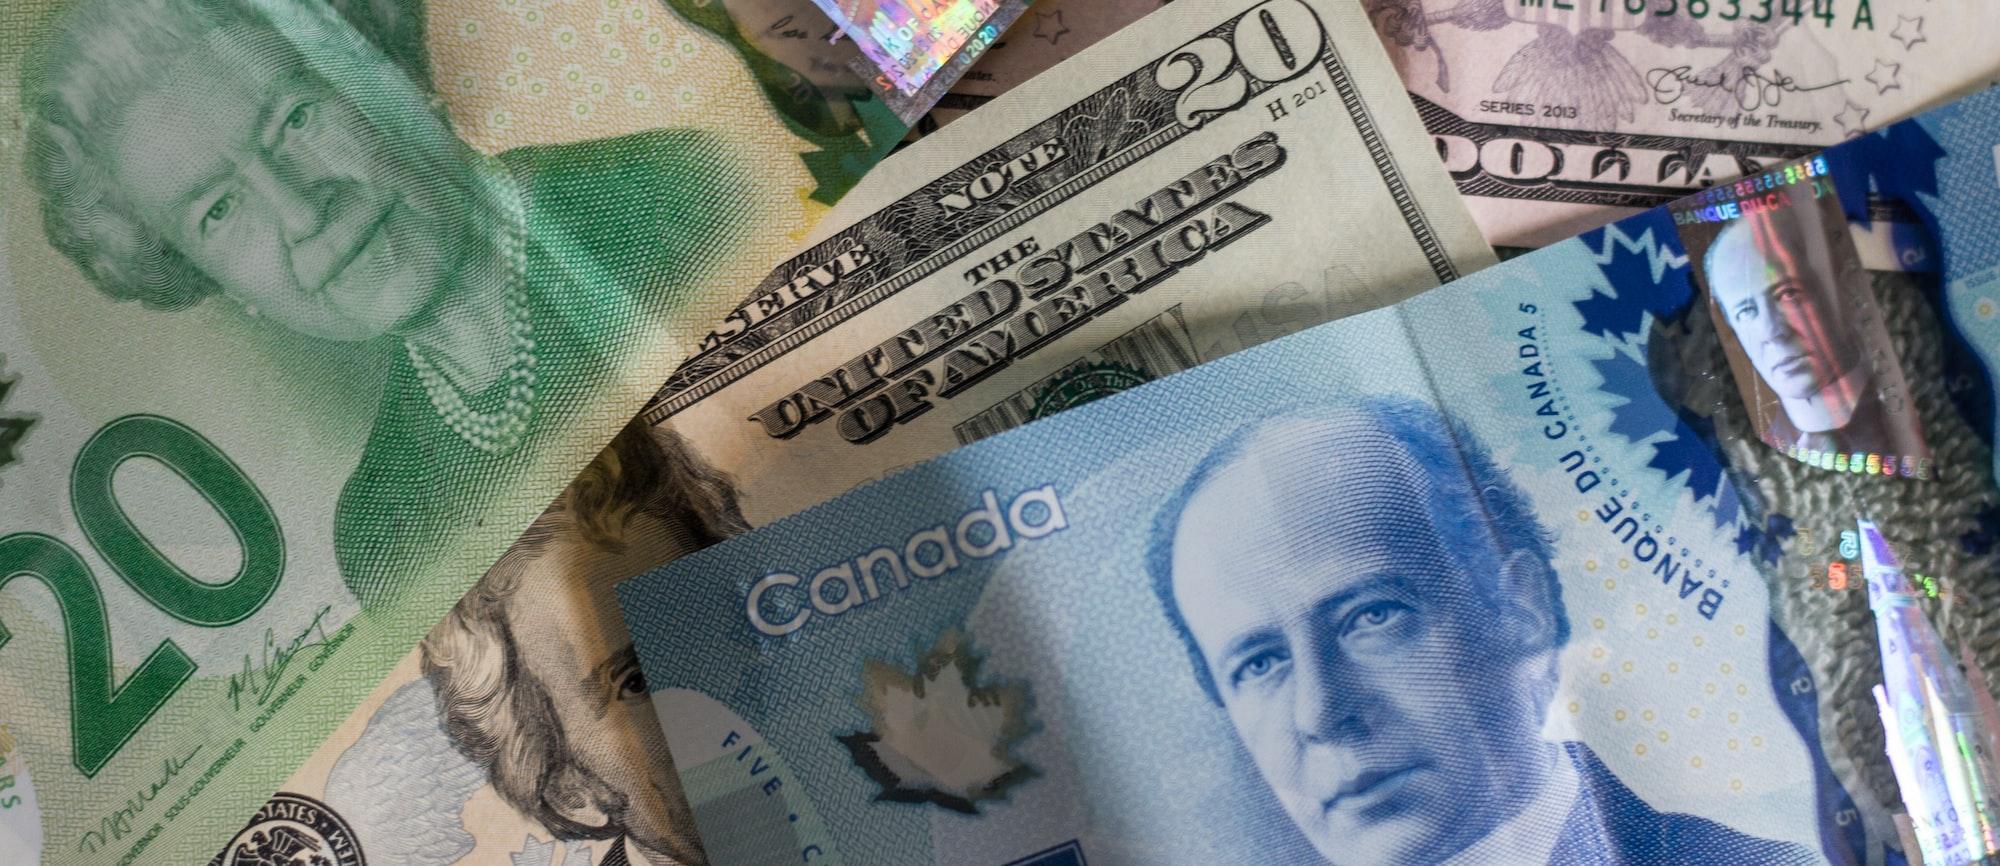 CFM Shares Clarifications About Those CERB Repayment Letters